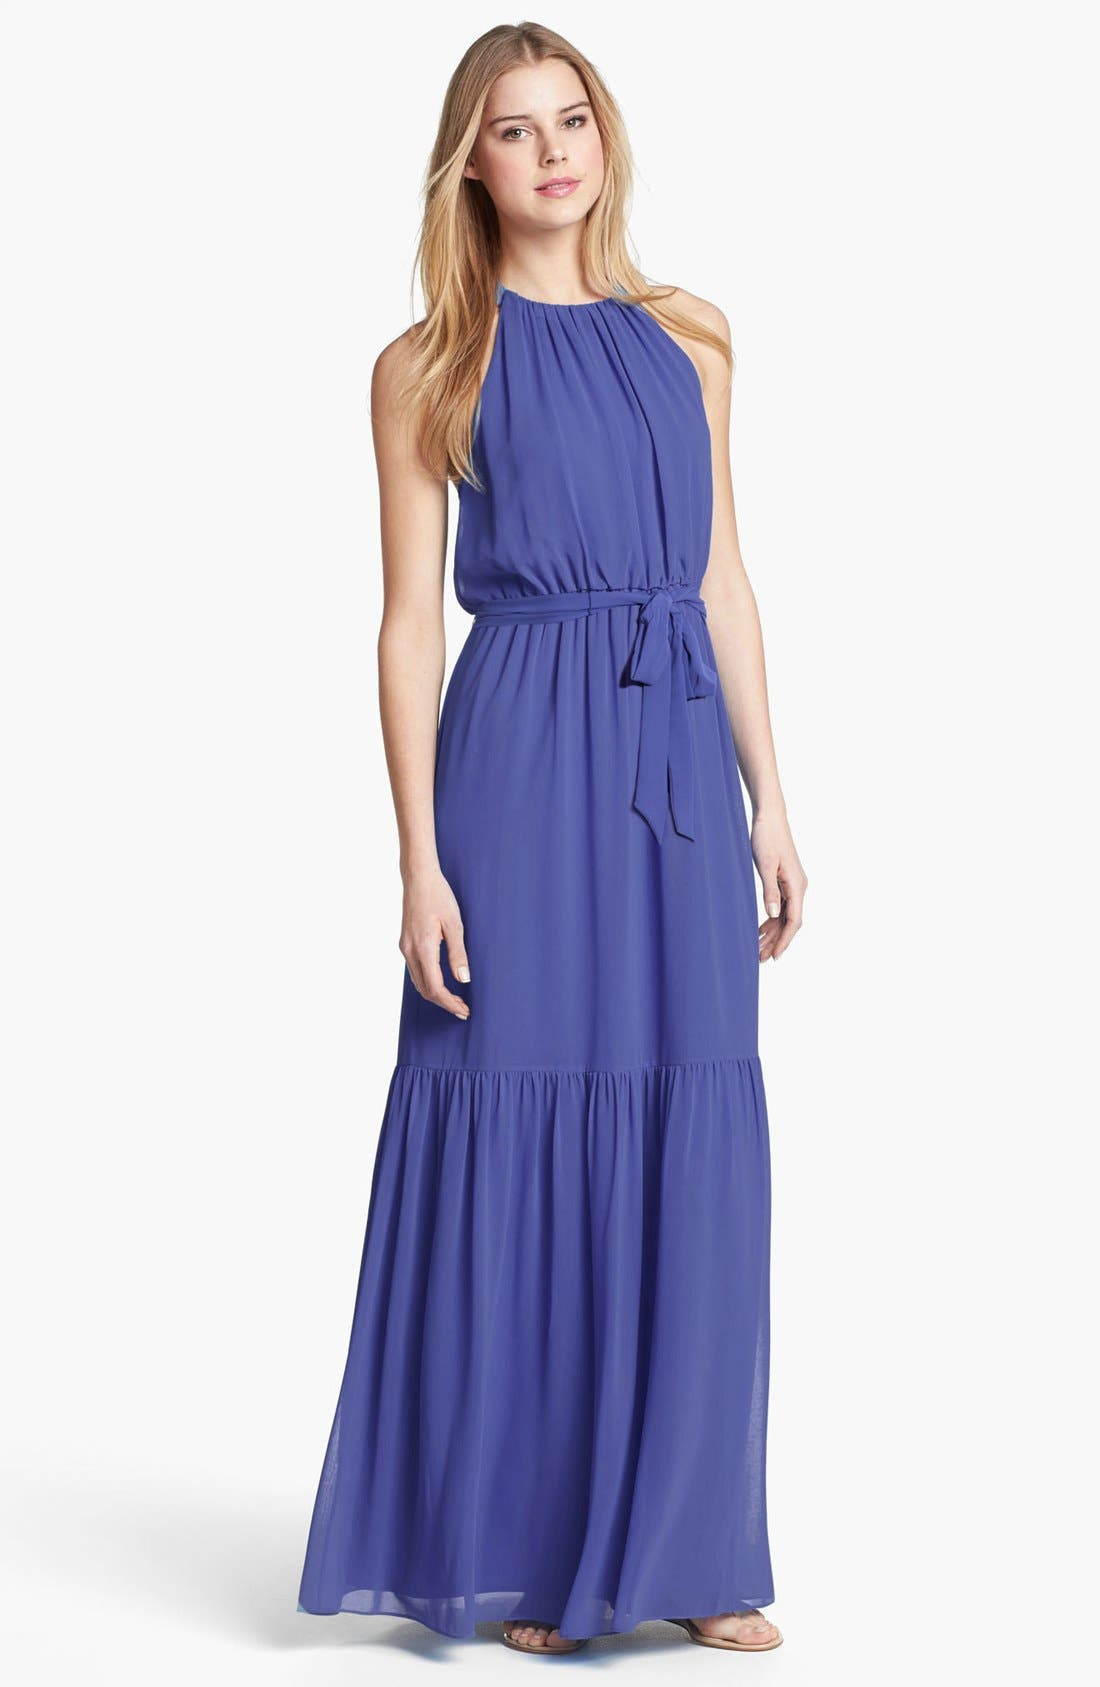 Main Image - Jessica Simpson Laser Cutout Maxi Dress